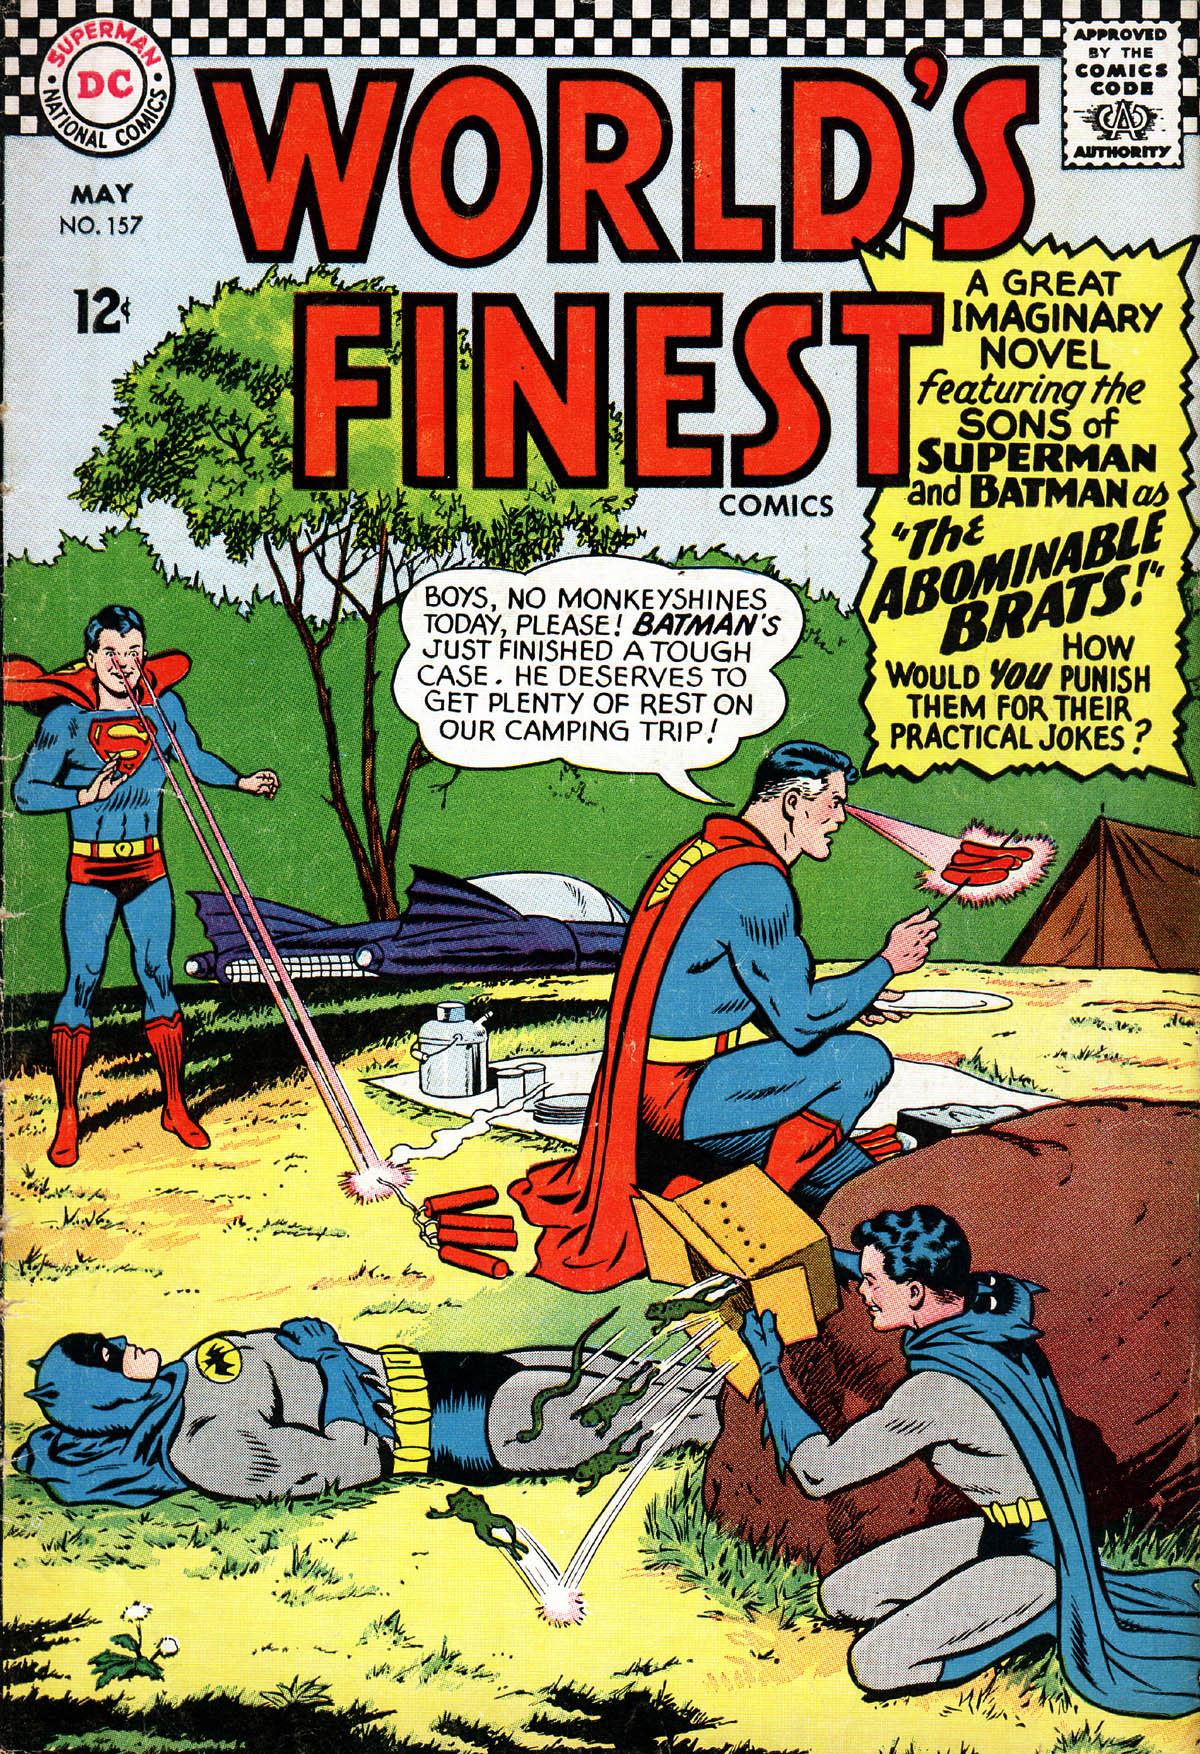 Read online World's Finest Comics comic -  Issue #157 - 1